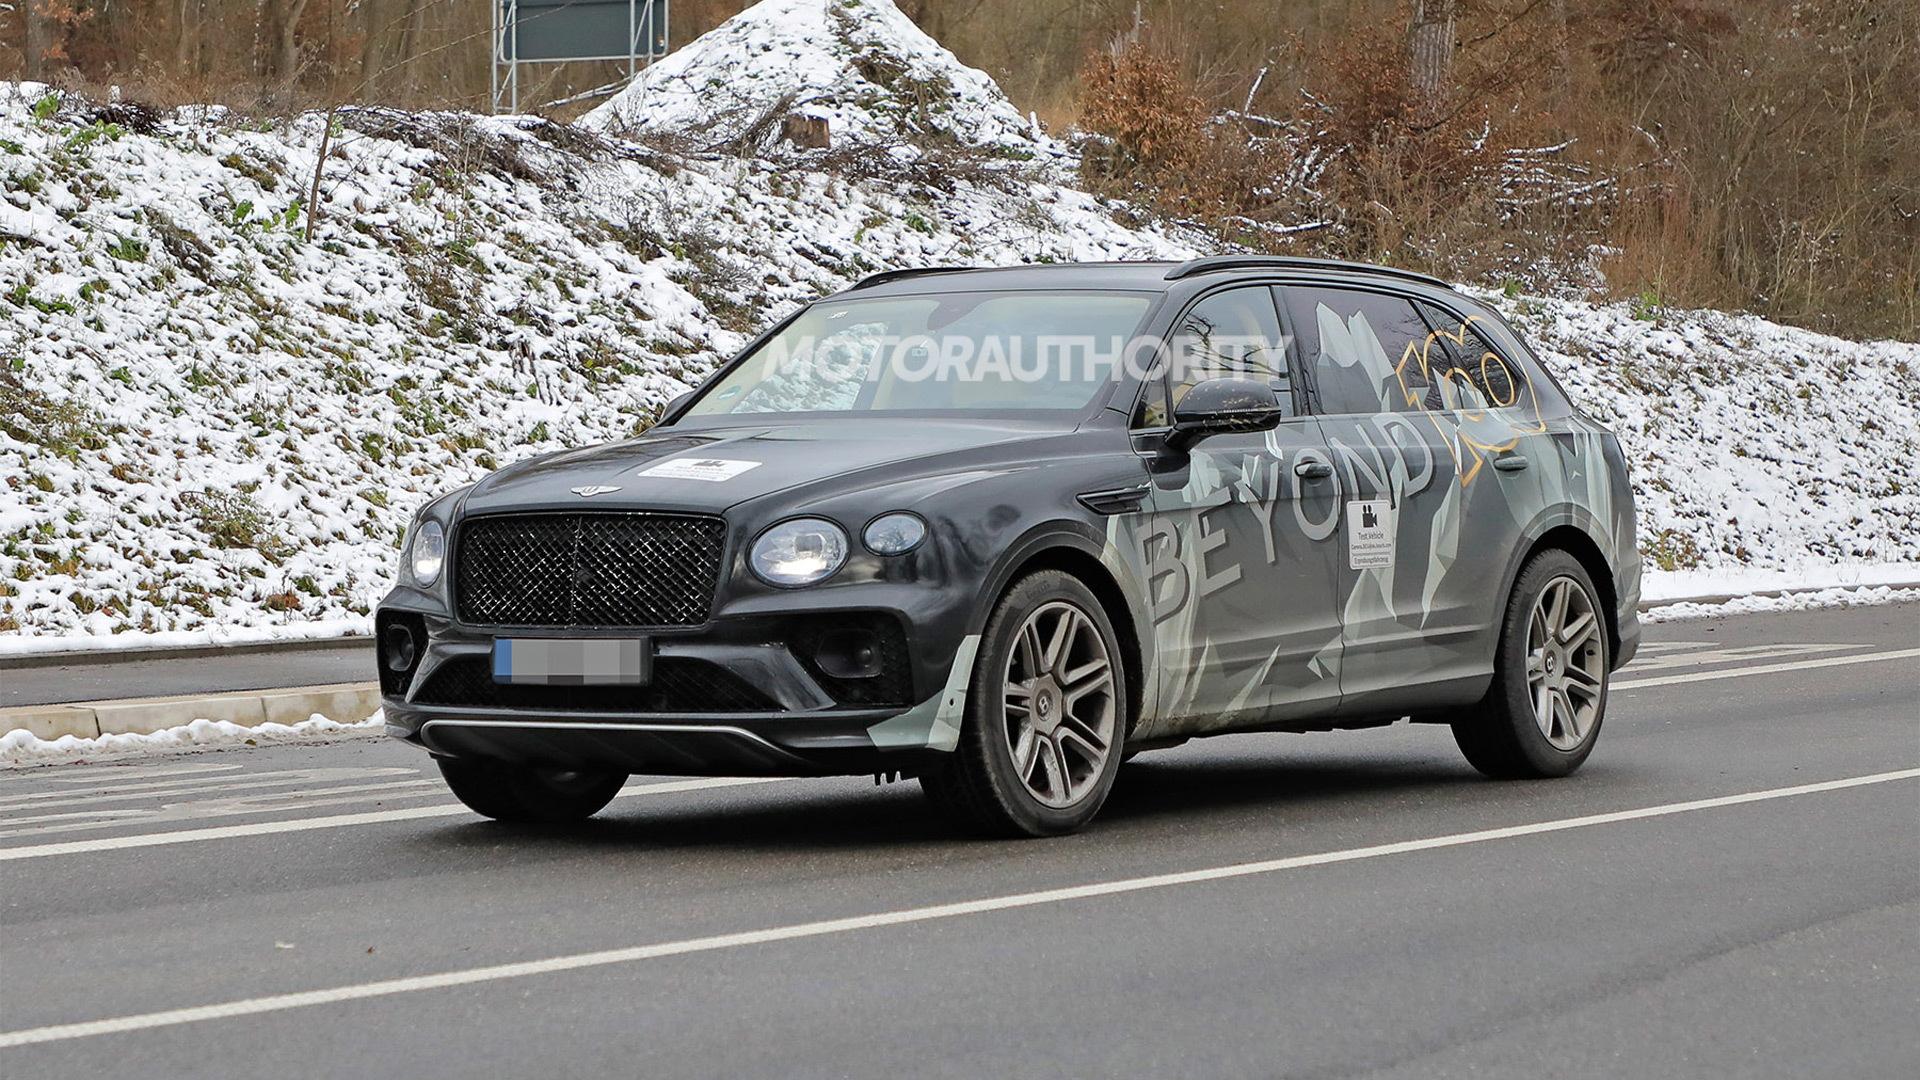 2022 Bentley Bentayga Extended Wheelbase spy shots - Photo credit: S. Baldauf/SB-Medien